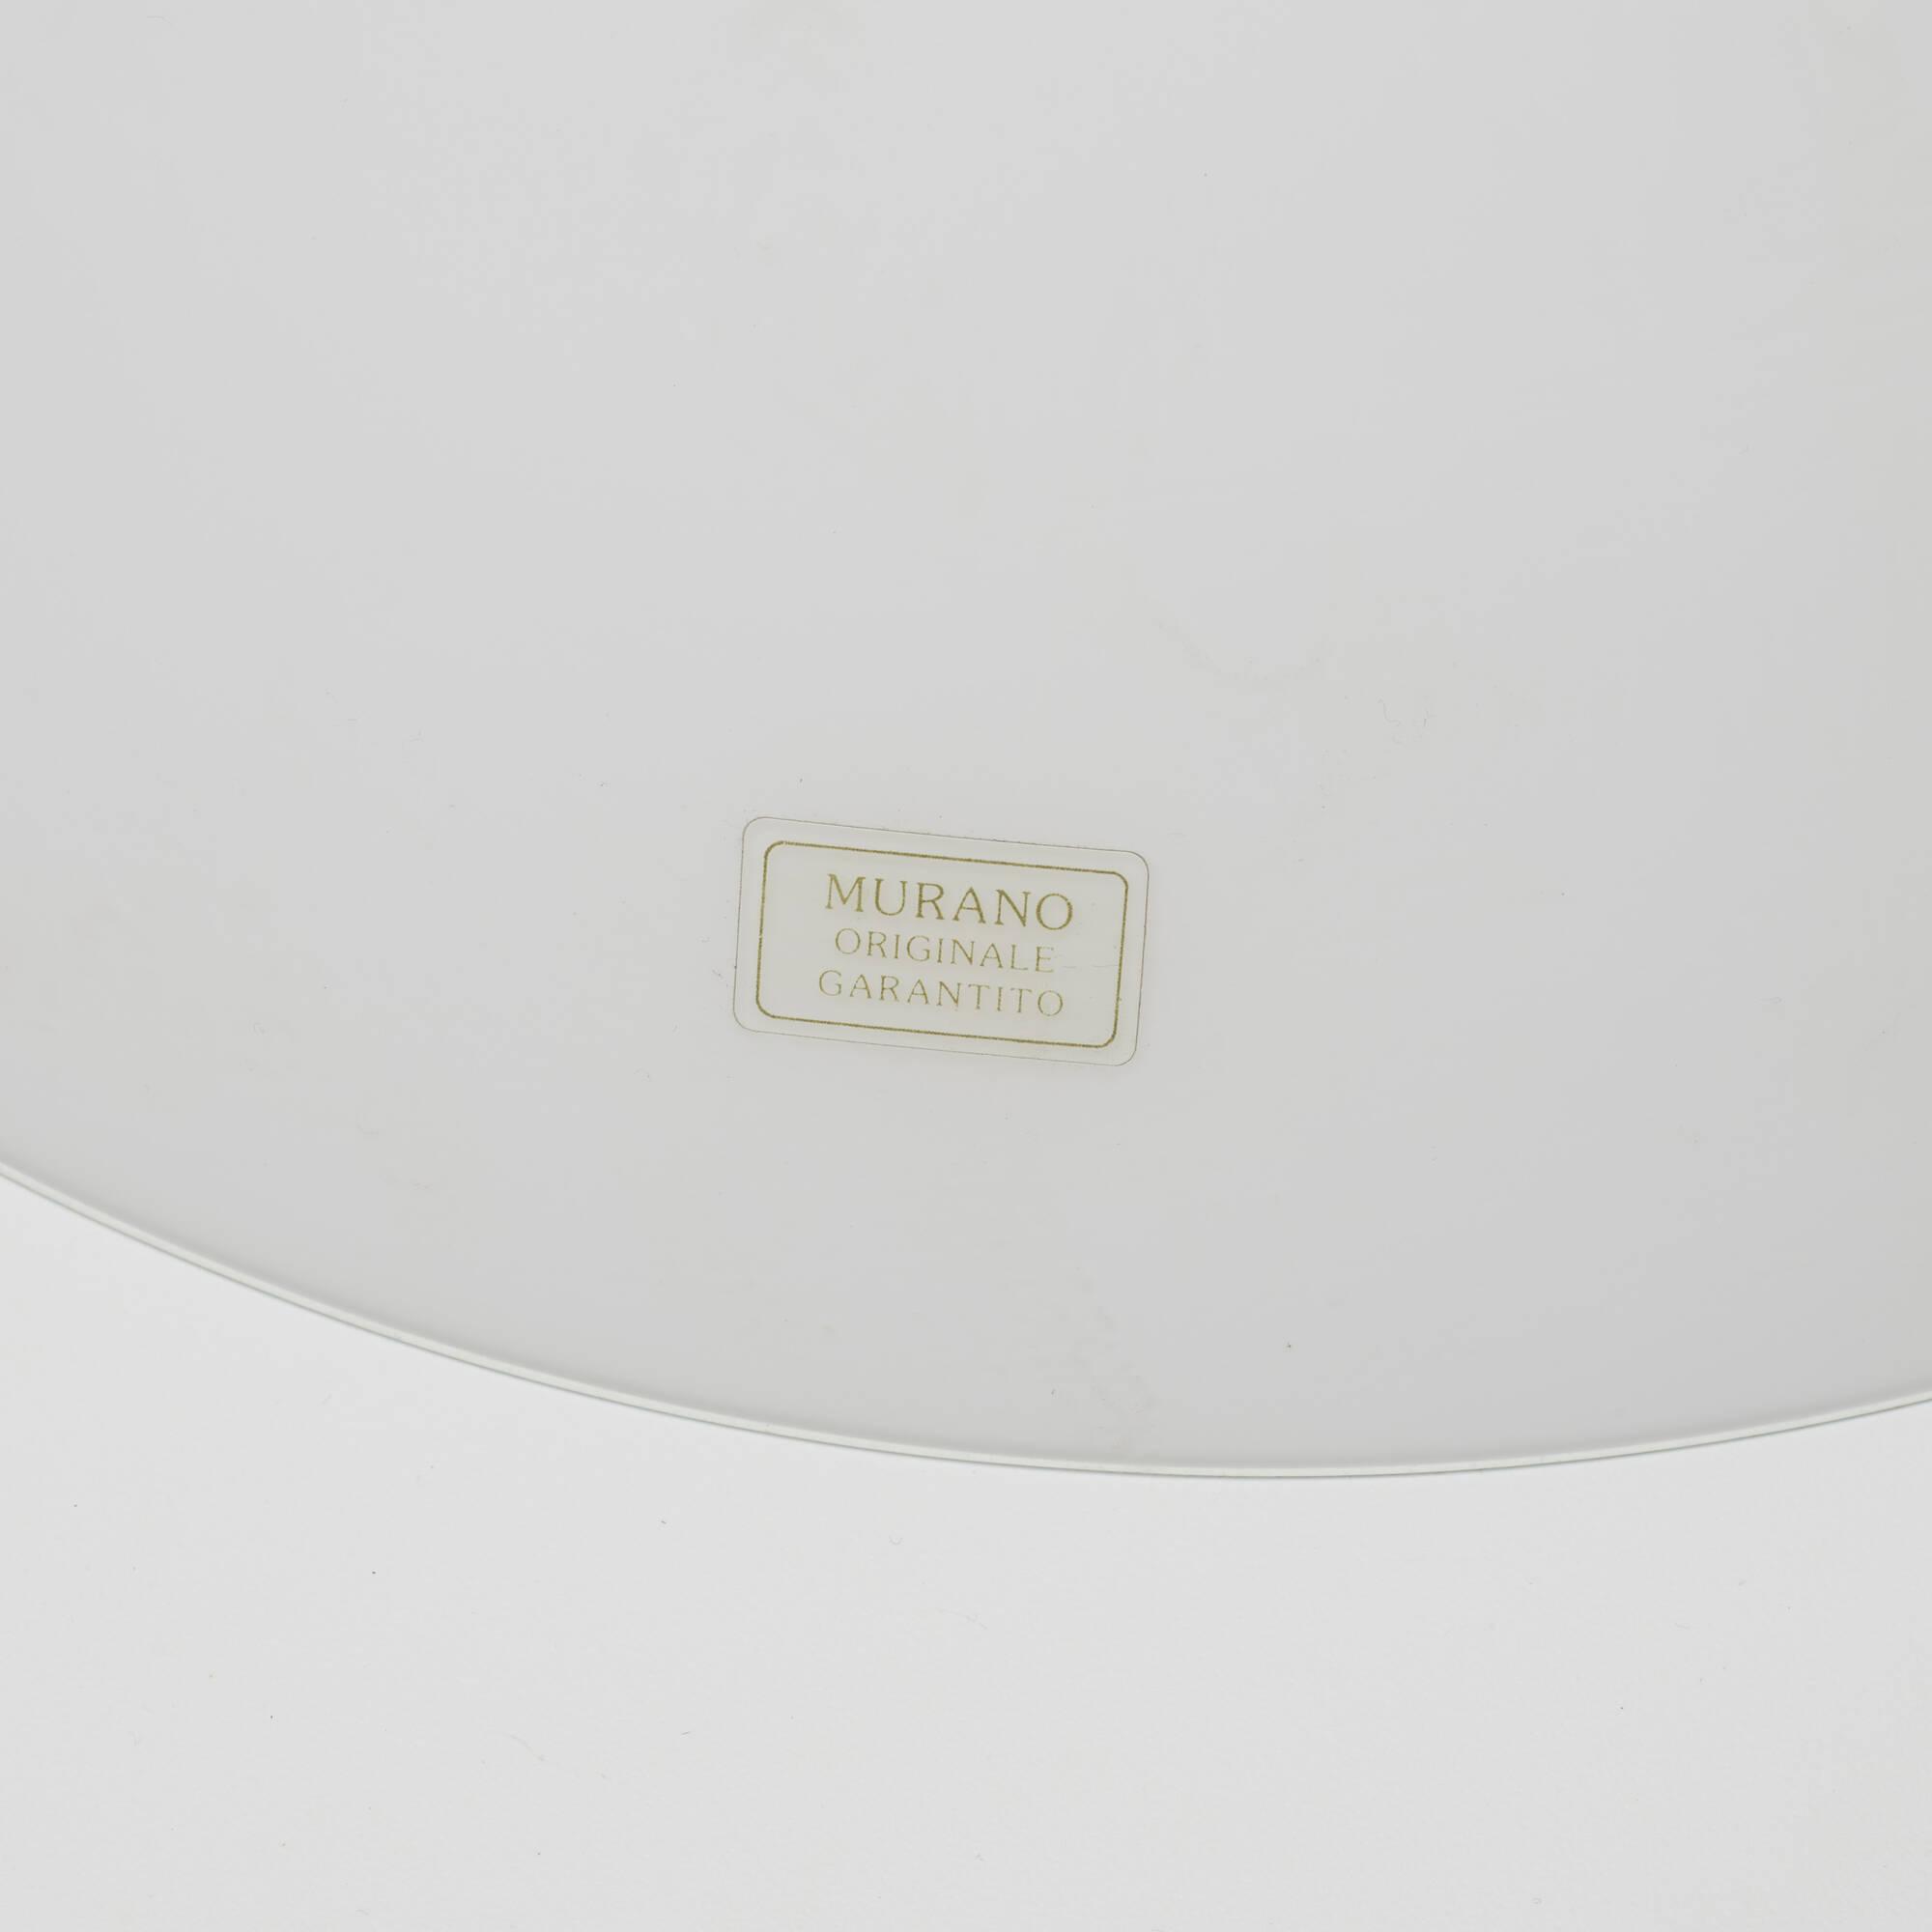 408: Angelo Mangiarotti / Chierico table lamp (3 of 3)